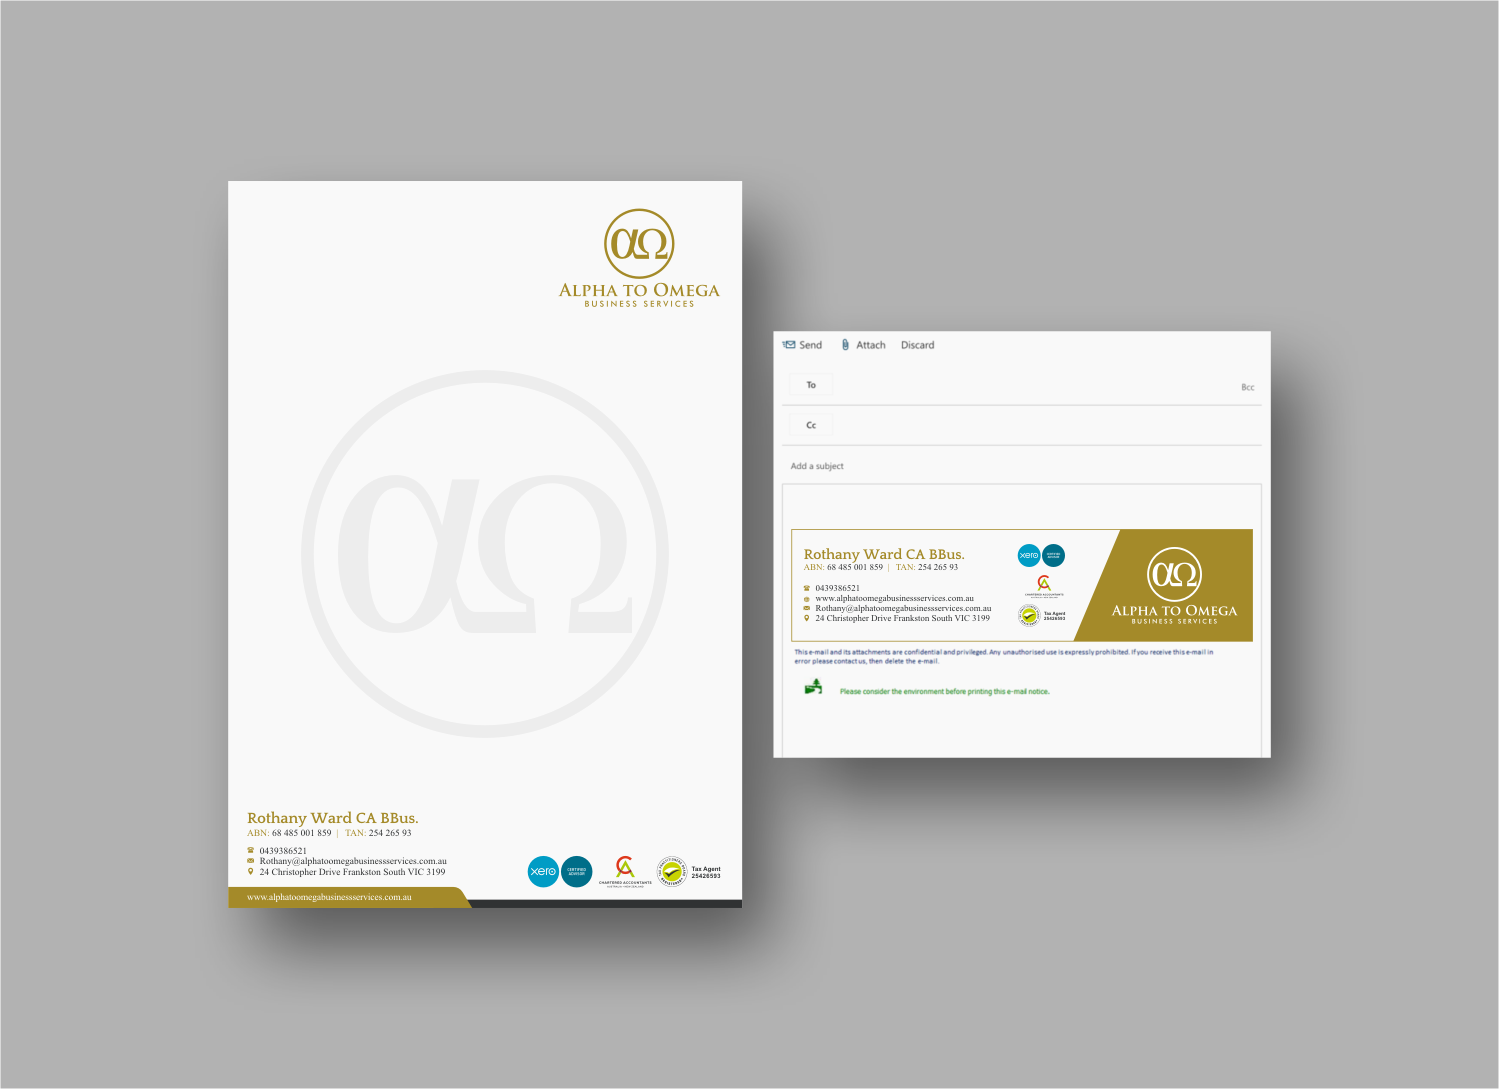 Upmarket Traditional Stationery Design for Alpha to Omega